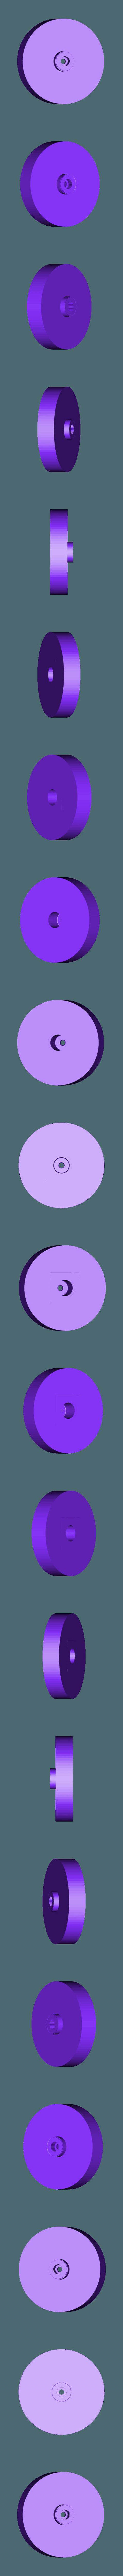 GADGETs_wheel.stl Download free STL file GADGET the robotic Gremlin • 3D printing object, atarka3